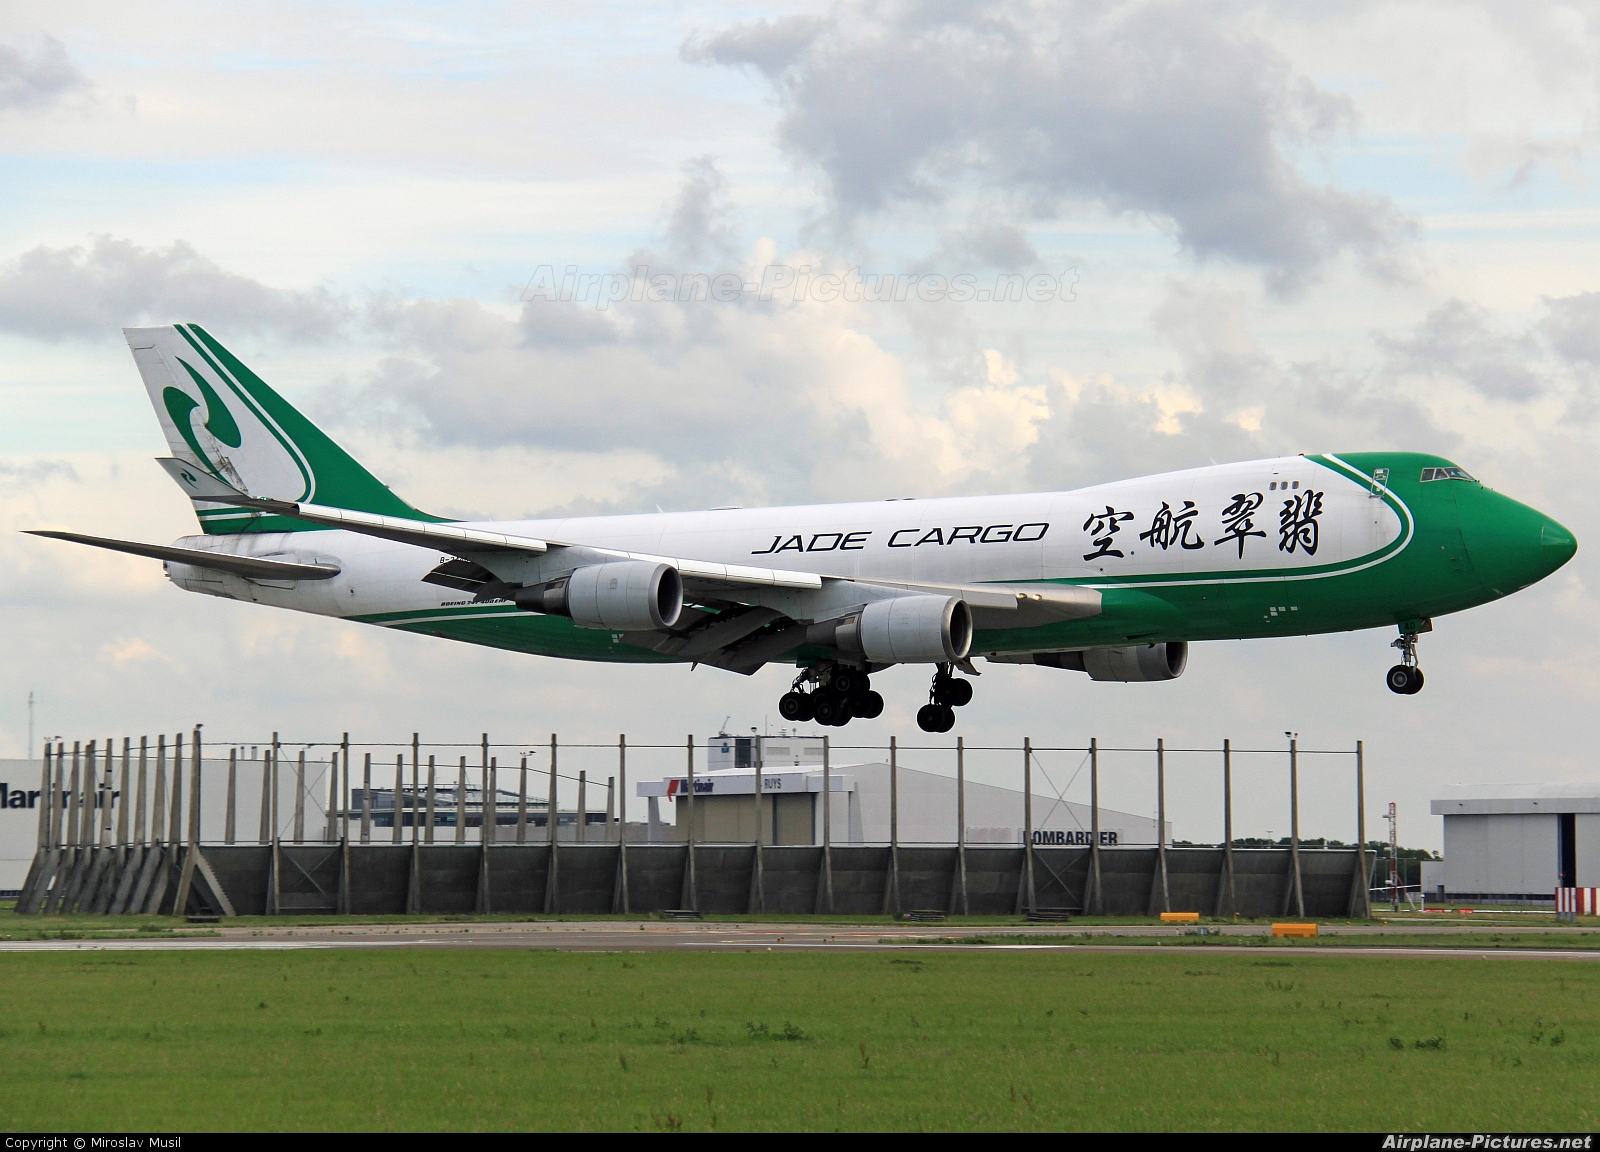 Jade Cargo B-2440 aircraft at Amsterdam - Schiphol